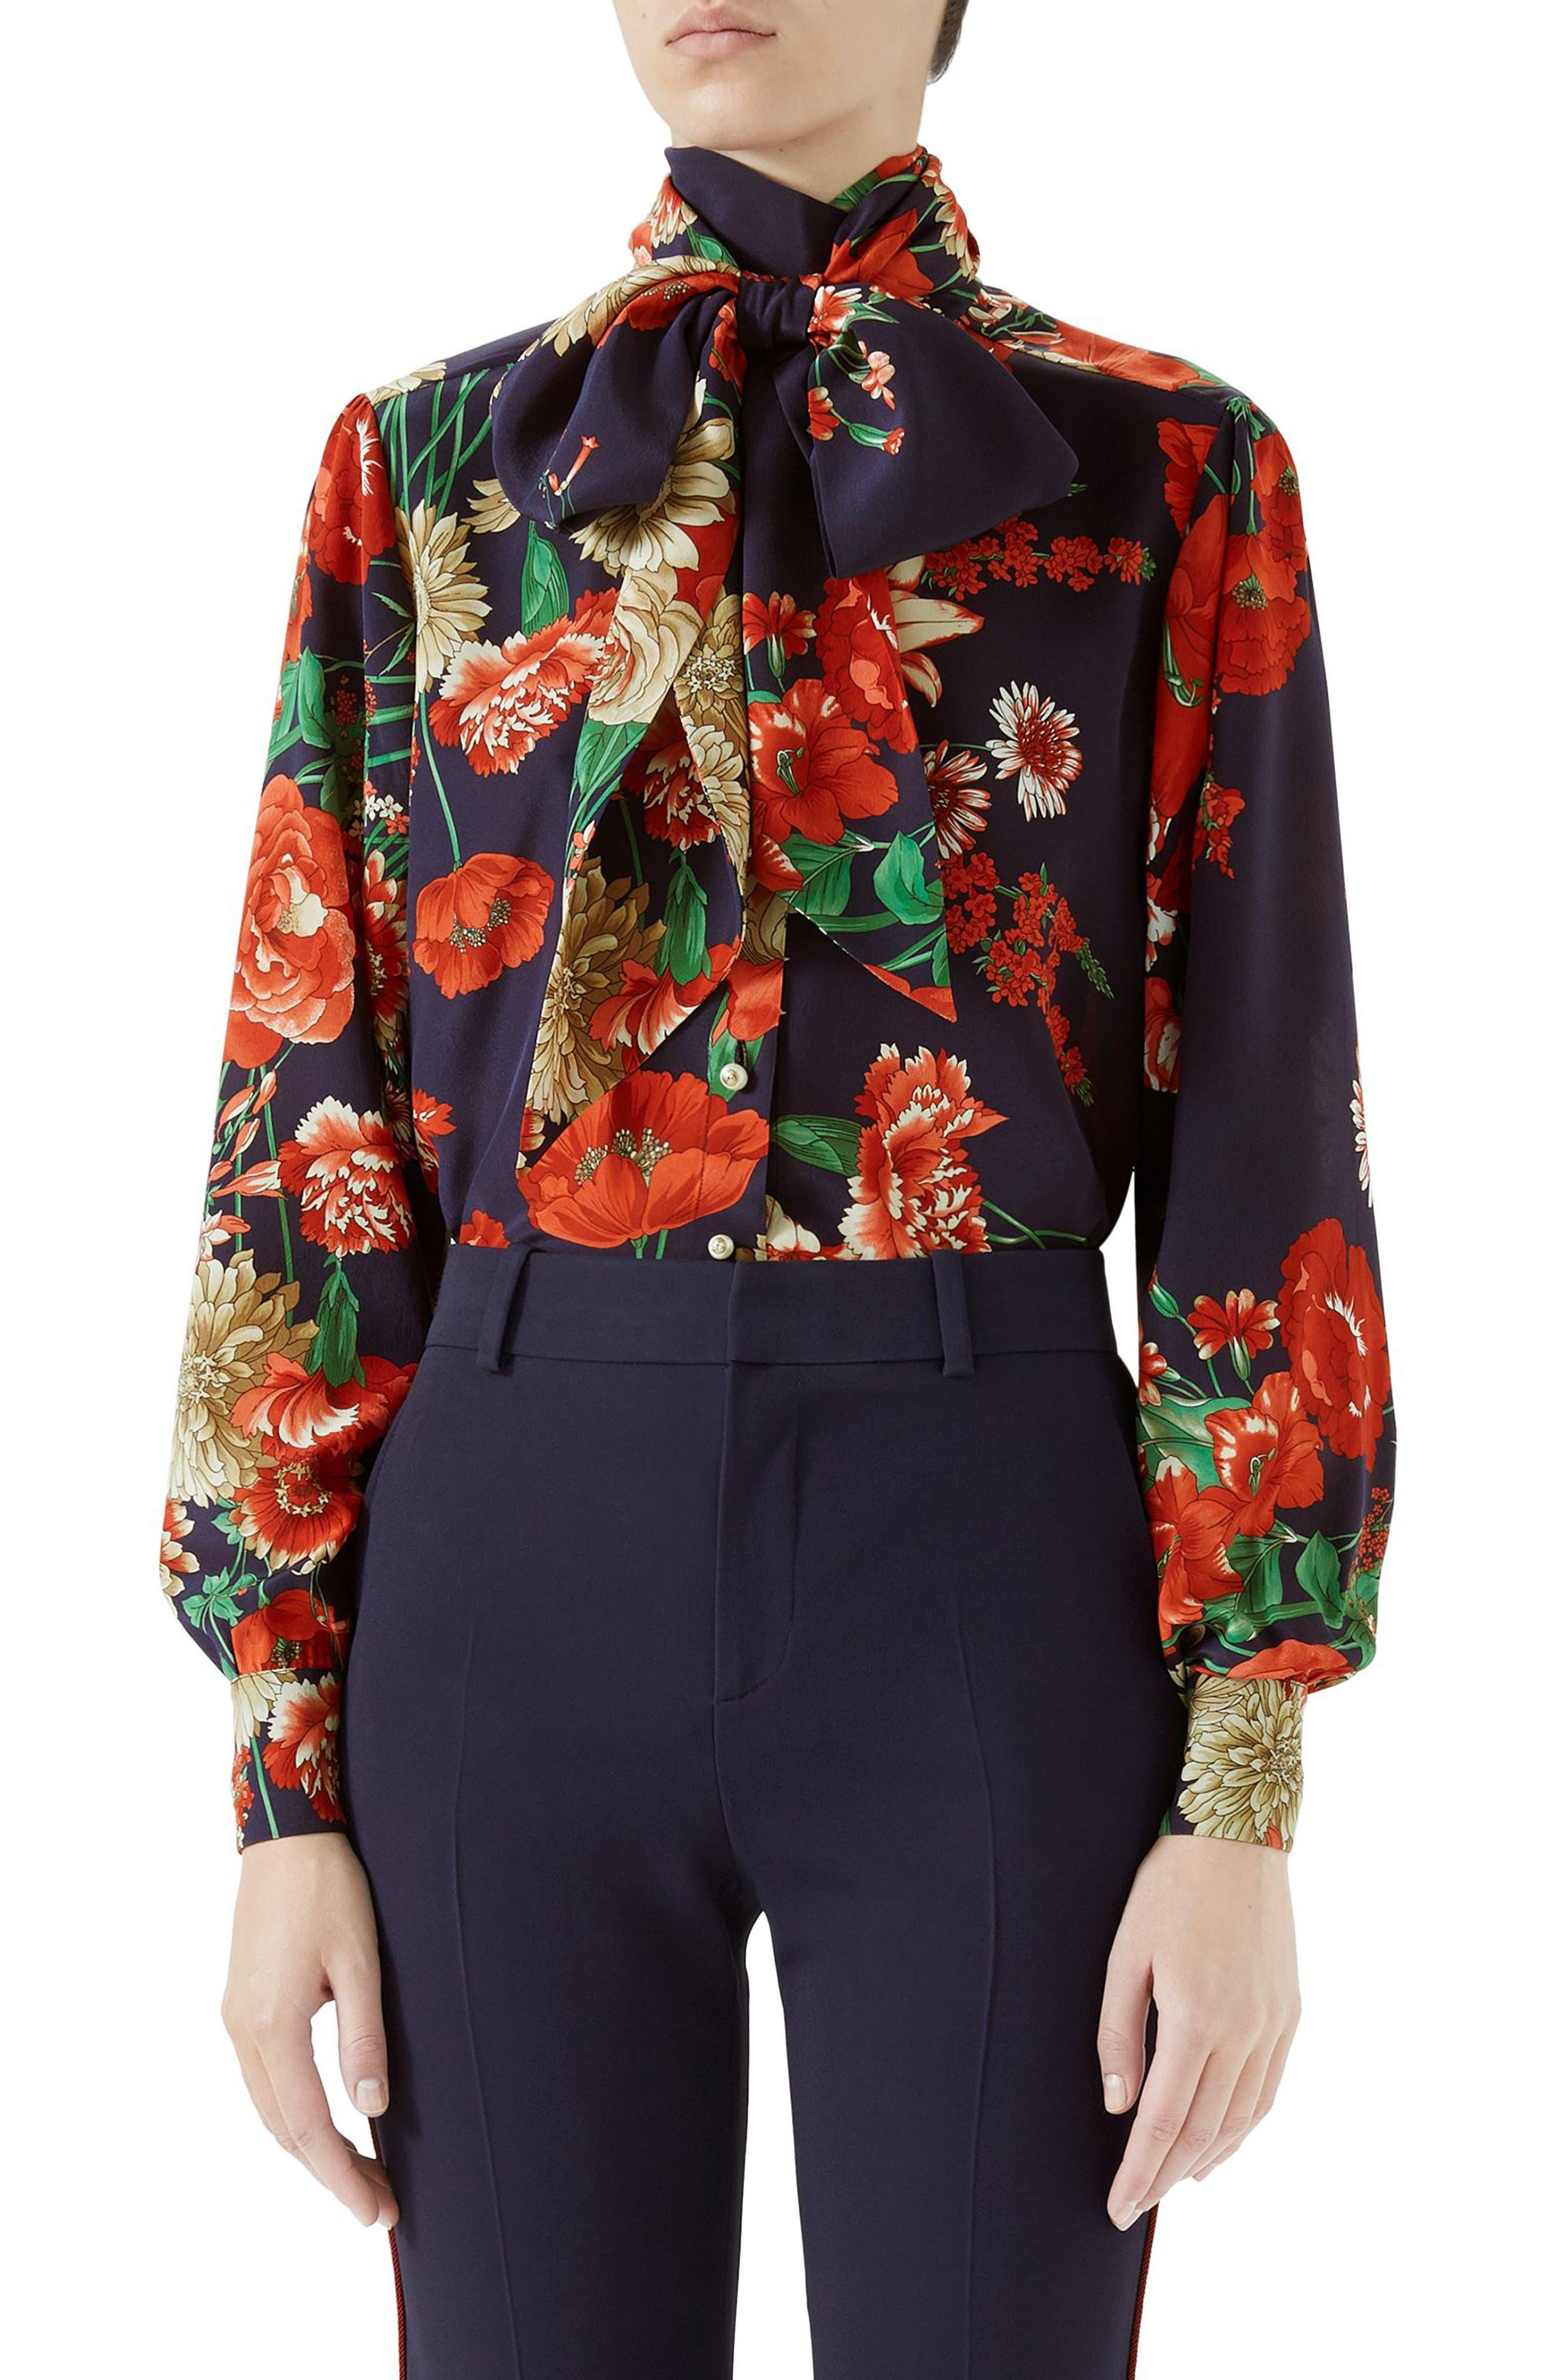 Spring Bouquet Print Tie Neck Silk Blouse,                             Main thumbnail 1, color,                             BLUE/ RED PRINT